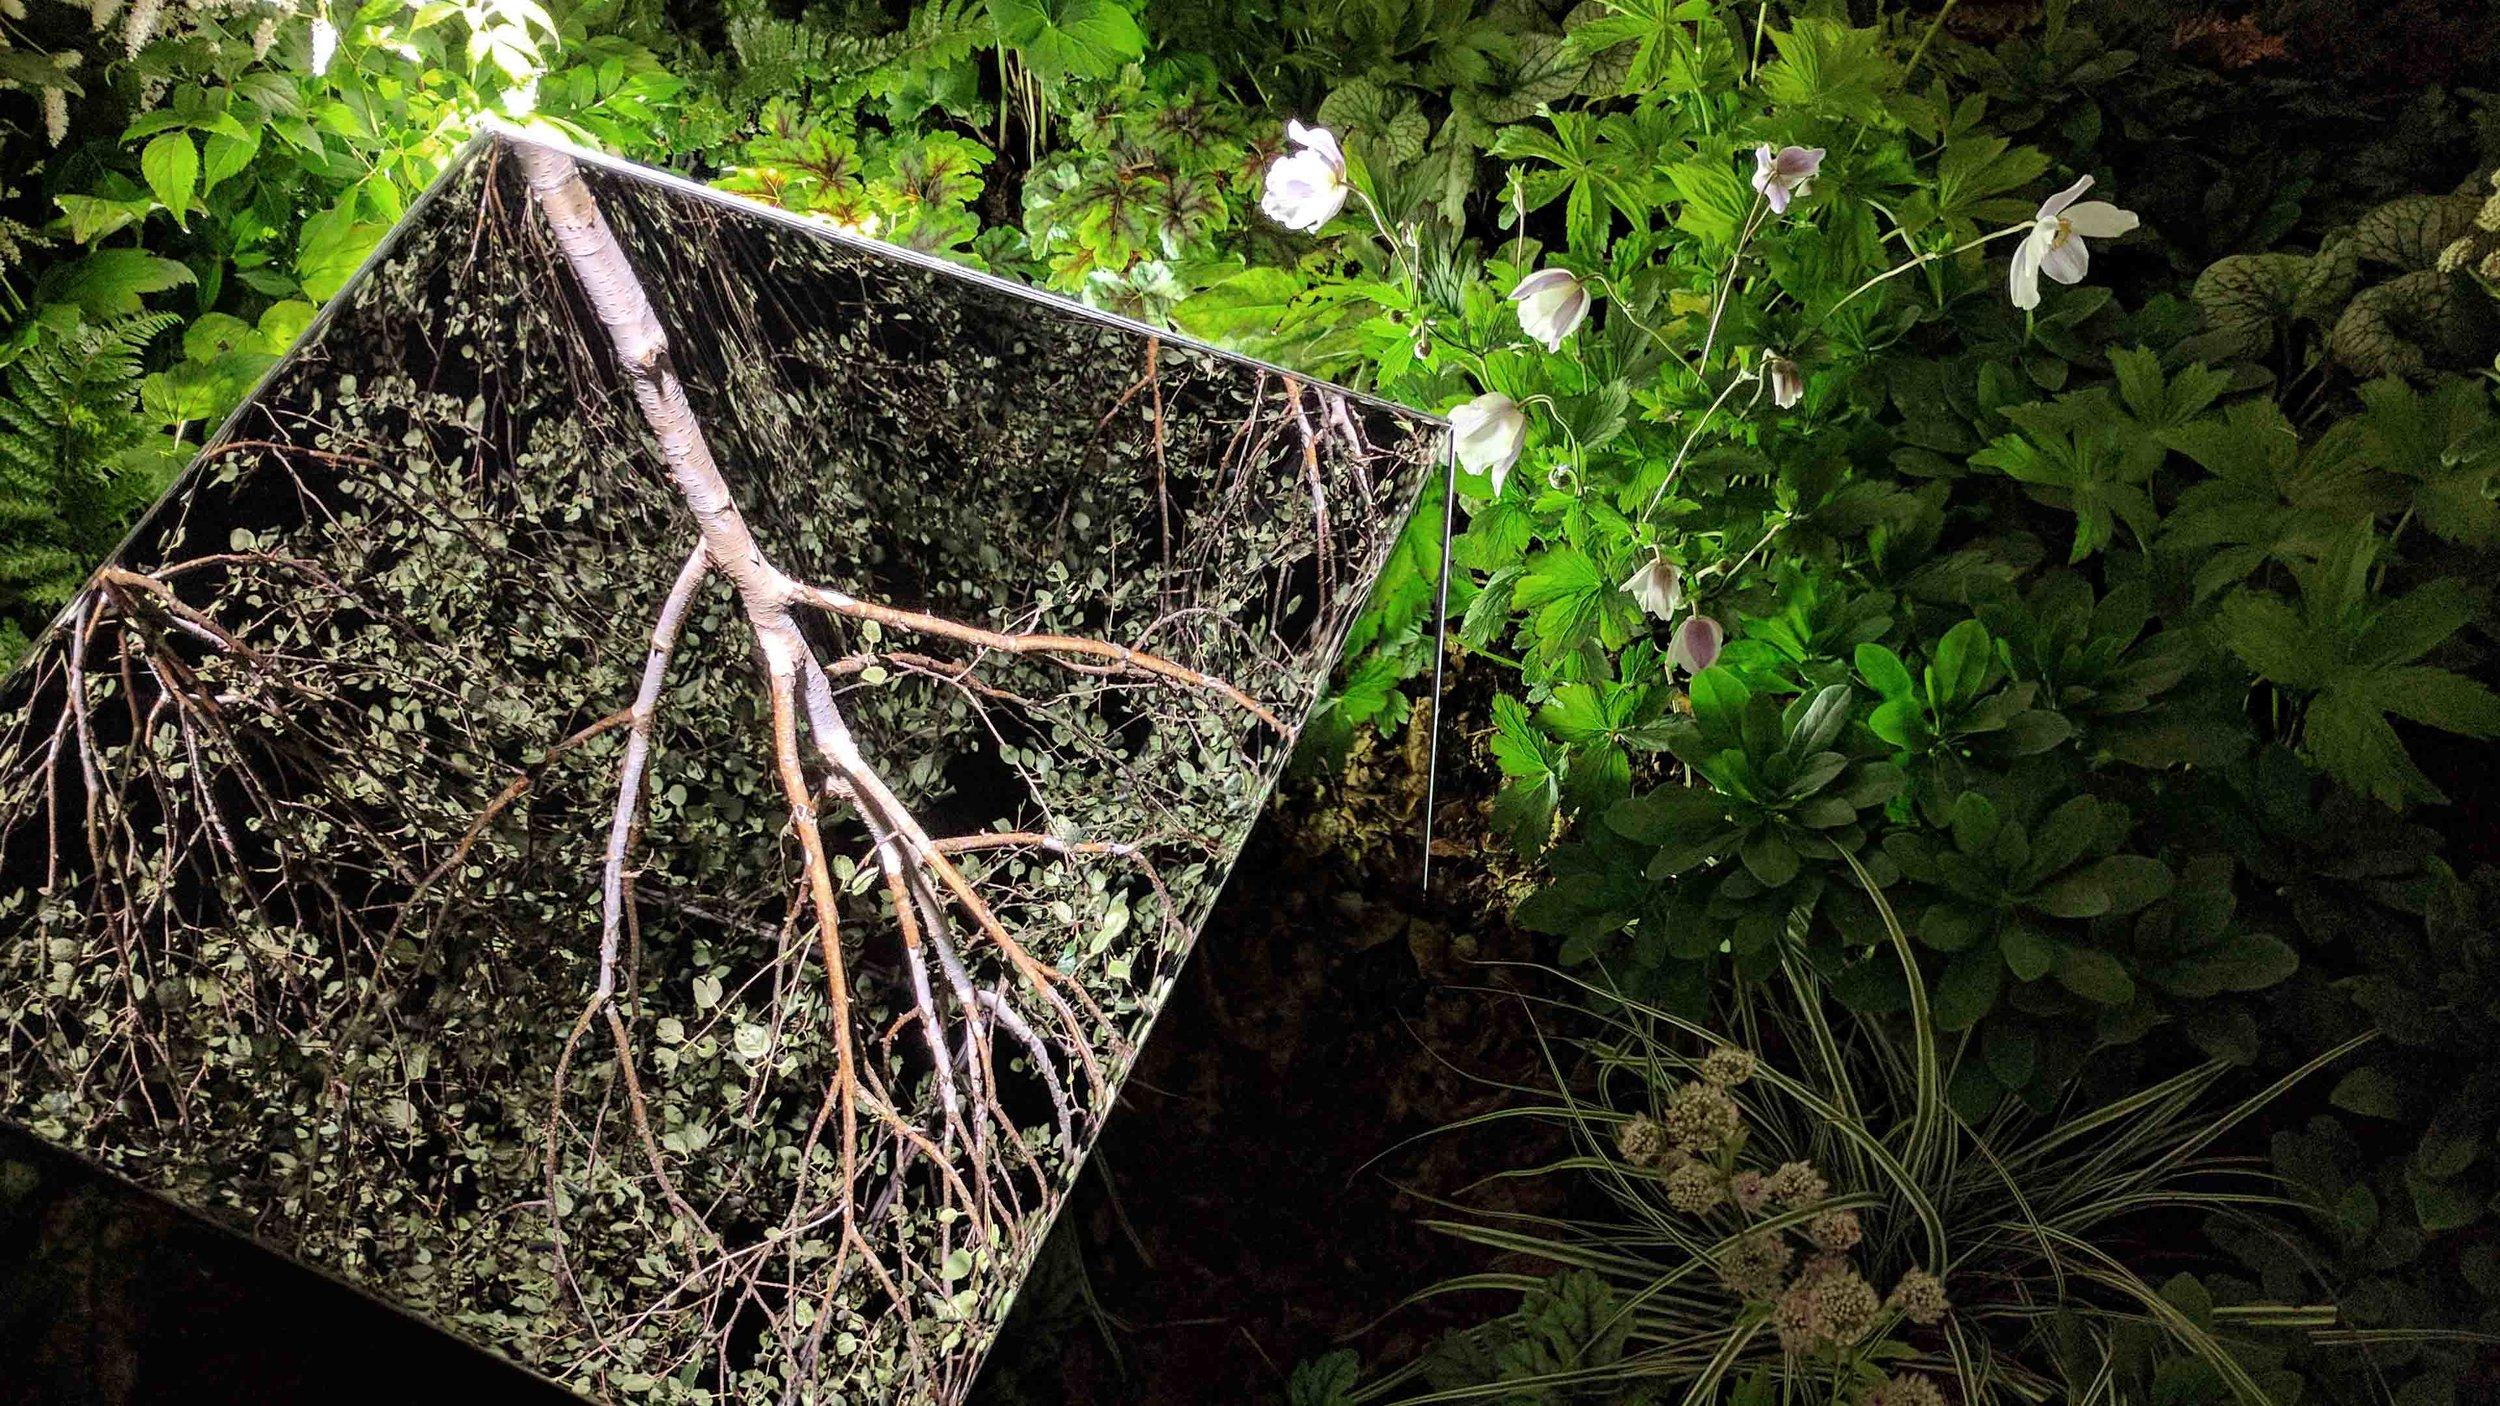 Southport Garden Design: Kuro: Inside The Mirrored Cube At Night